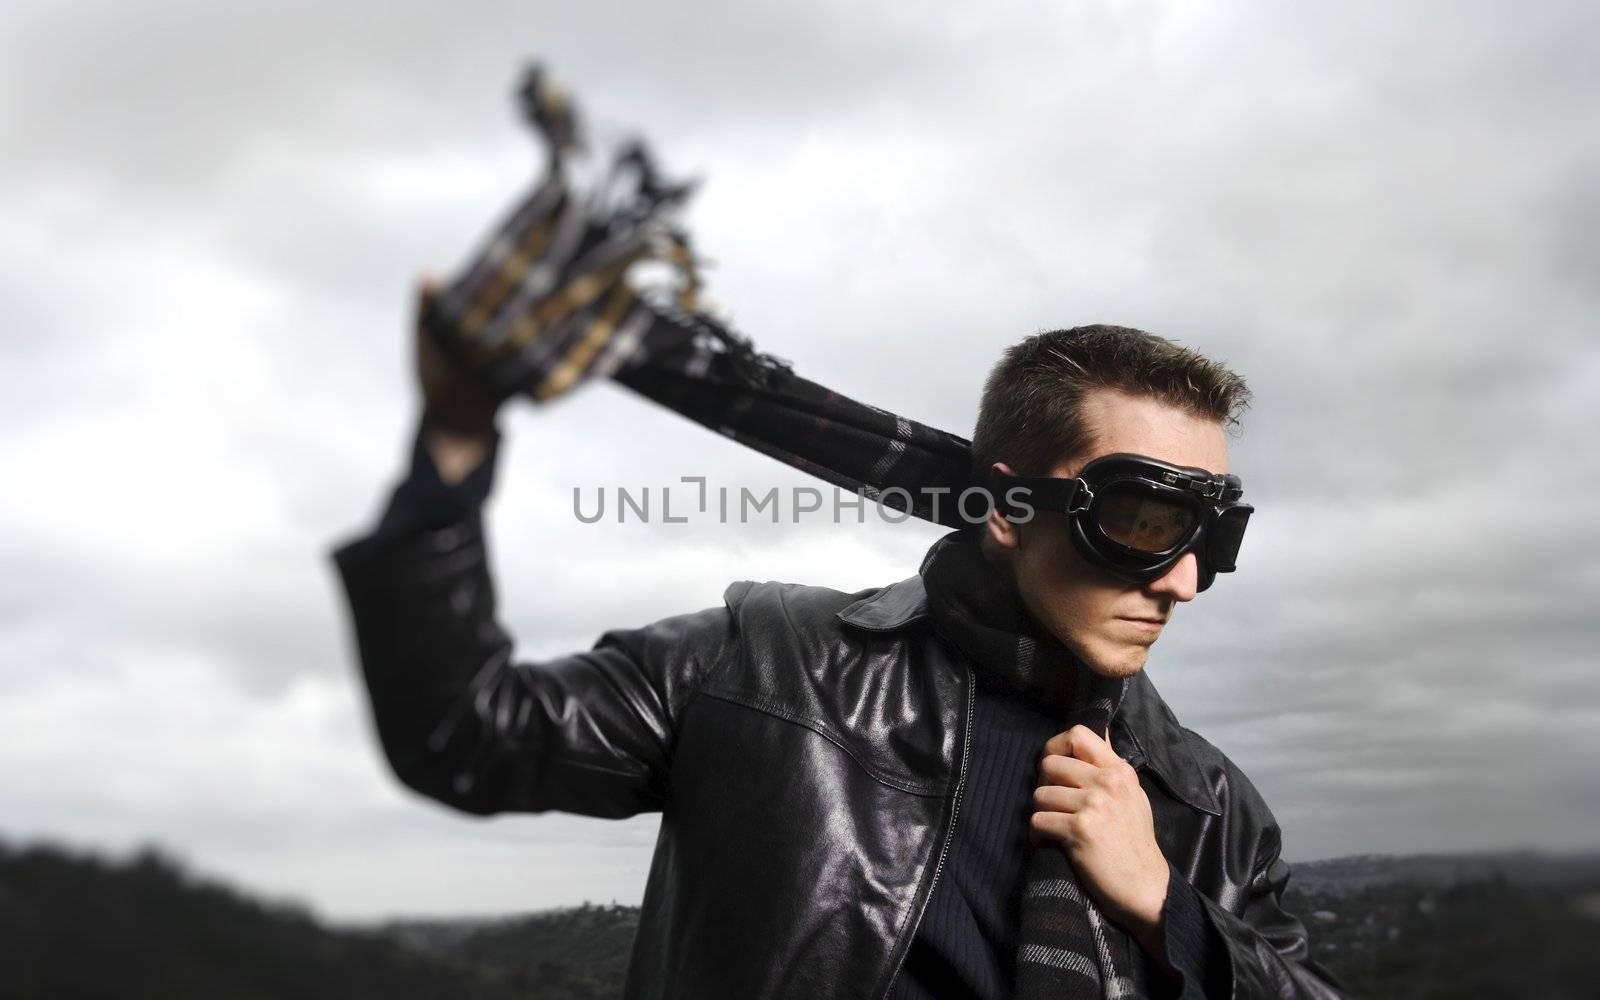 Male model poses as a pilot, selective focus